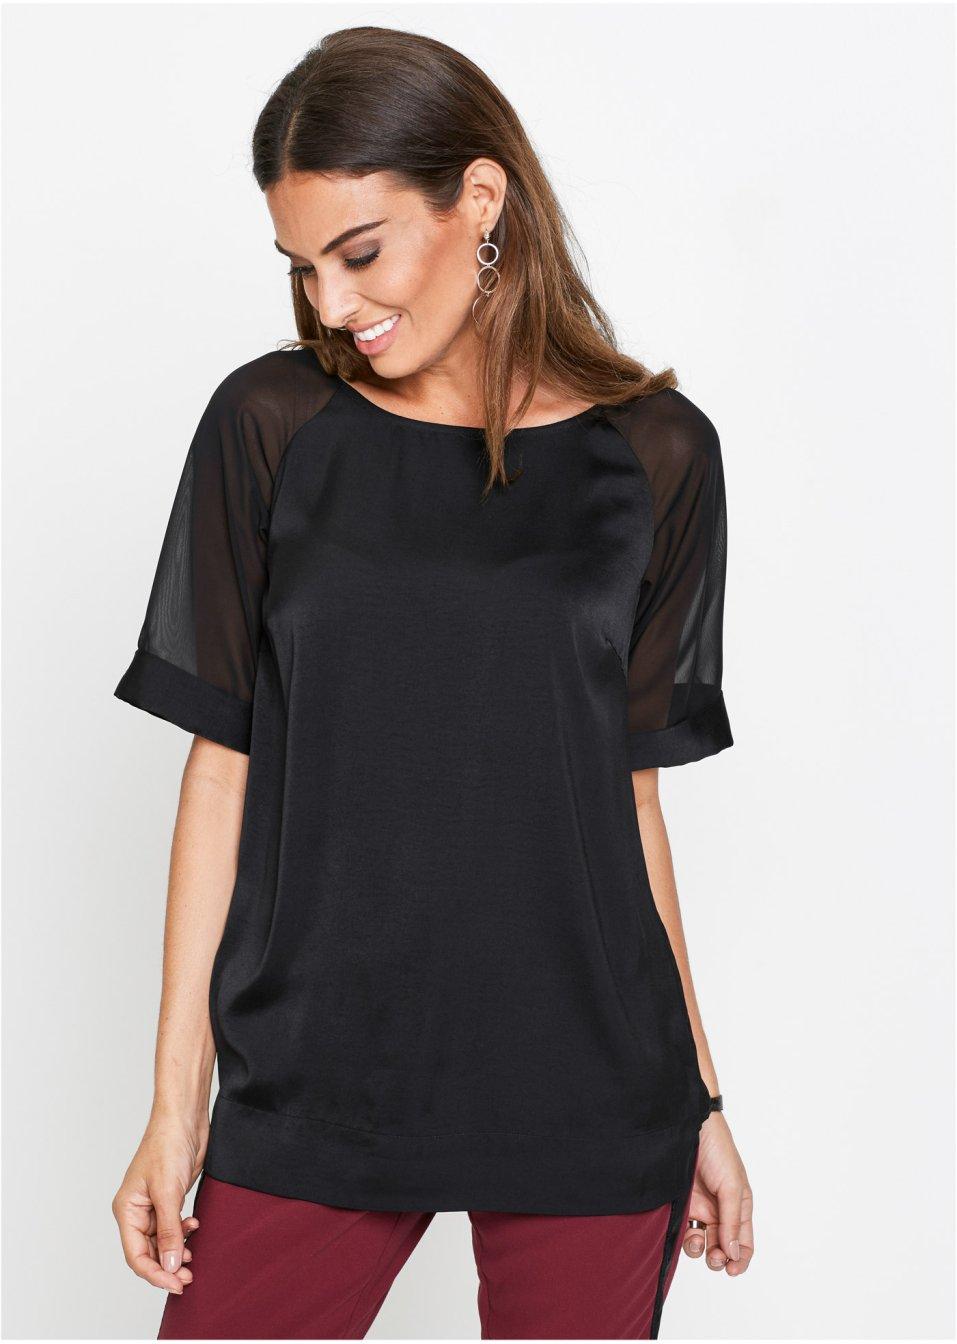 Elegante Satin-Tunika mit transparenten Ärmeln - schwarz 033e835065